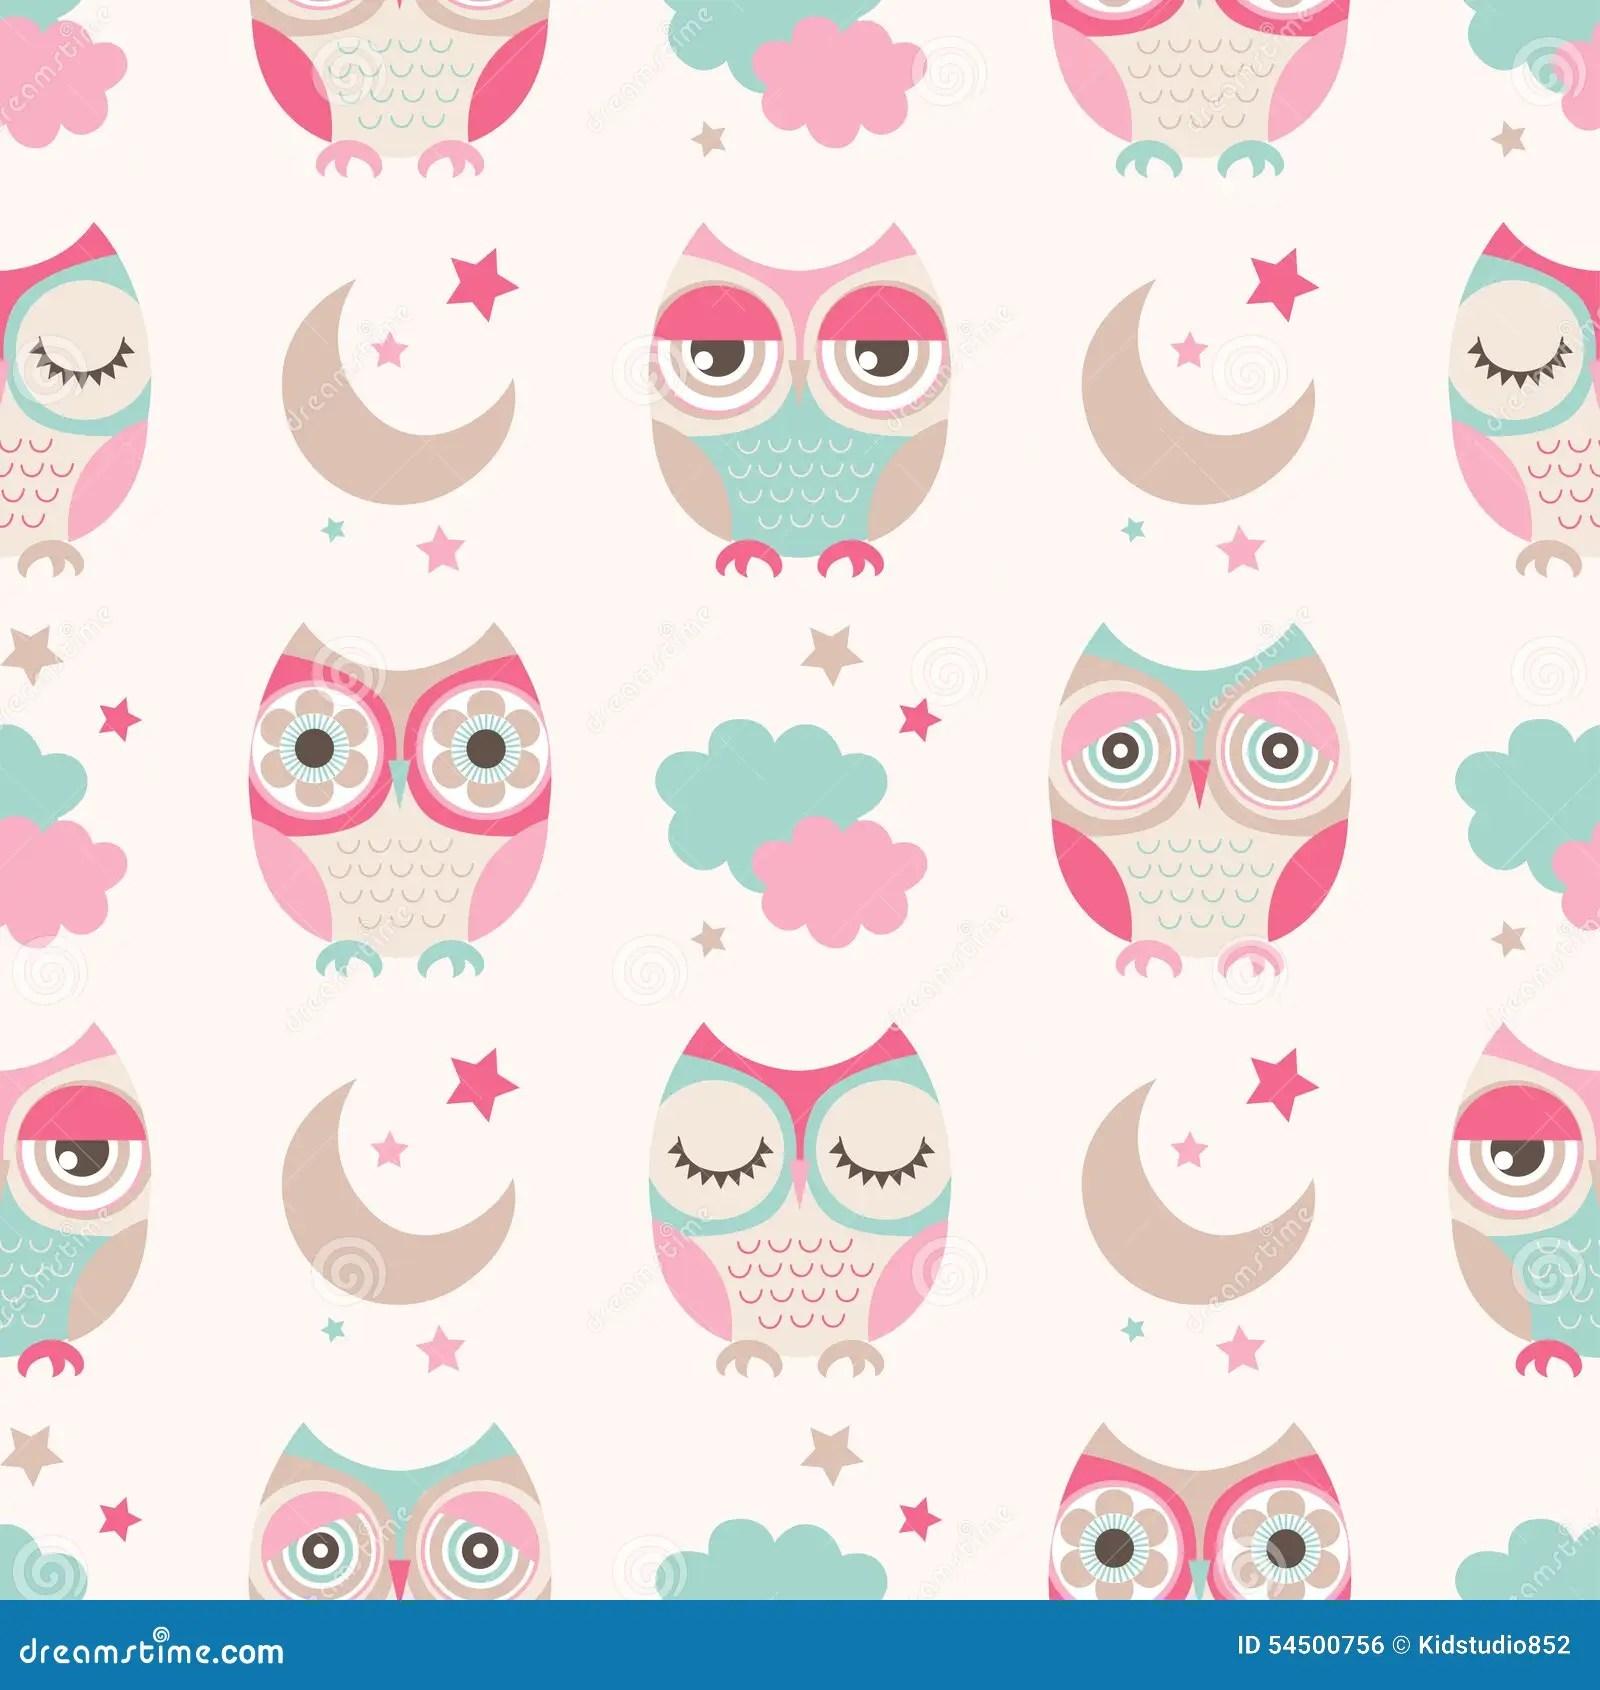 Pale Pink Wallpaper For Girl Nursery Seamless Cartoon Owls Birds Pattern Stock Vector Image